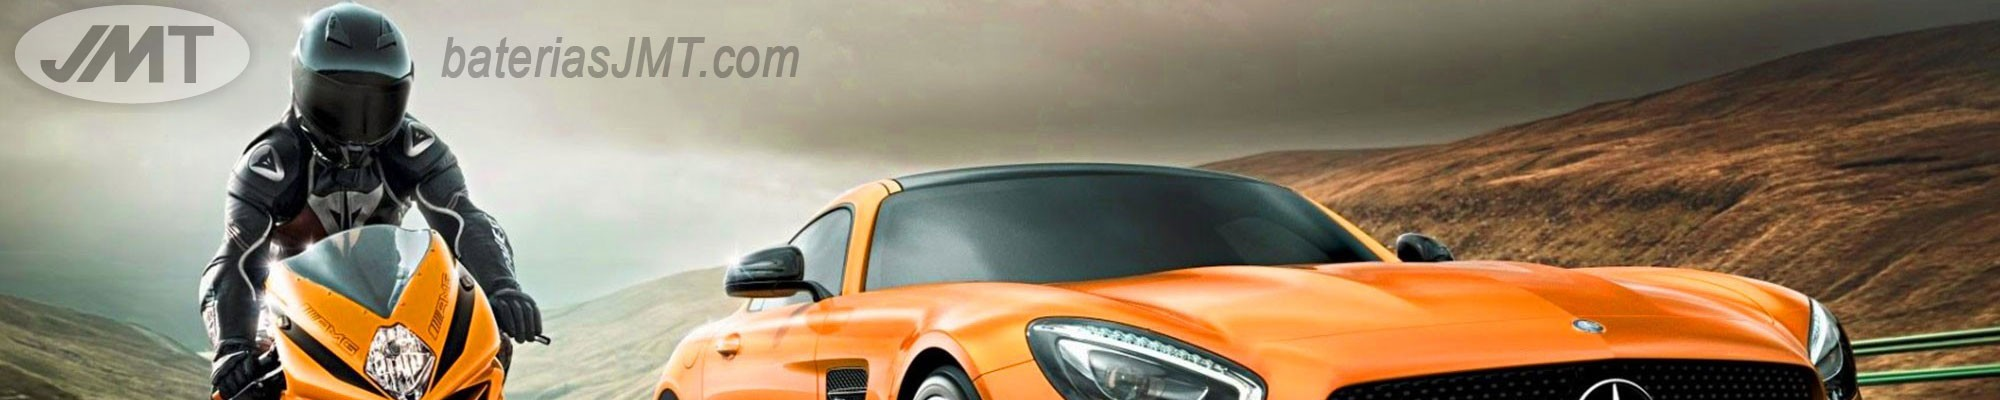 Baterías JMT para todo tipo de vehículos Litio Plomo Gel AGM